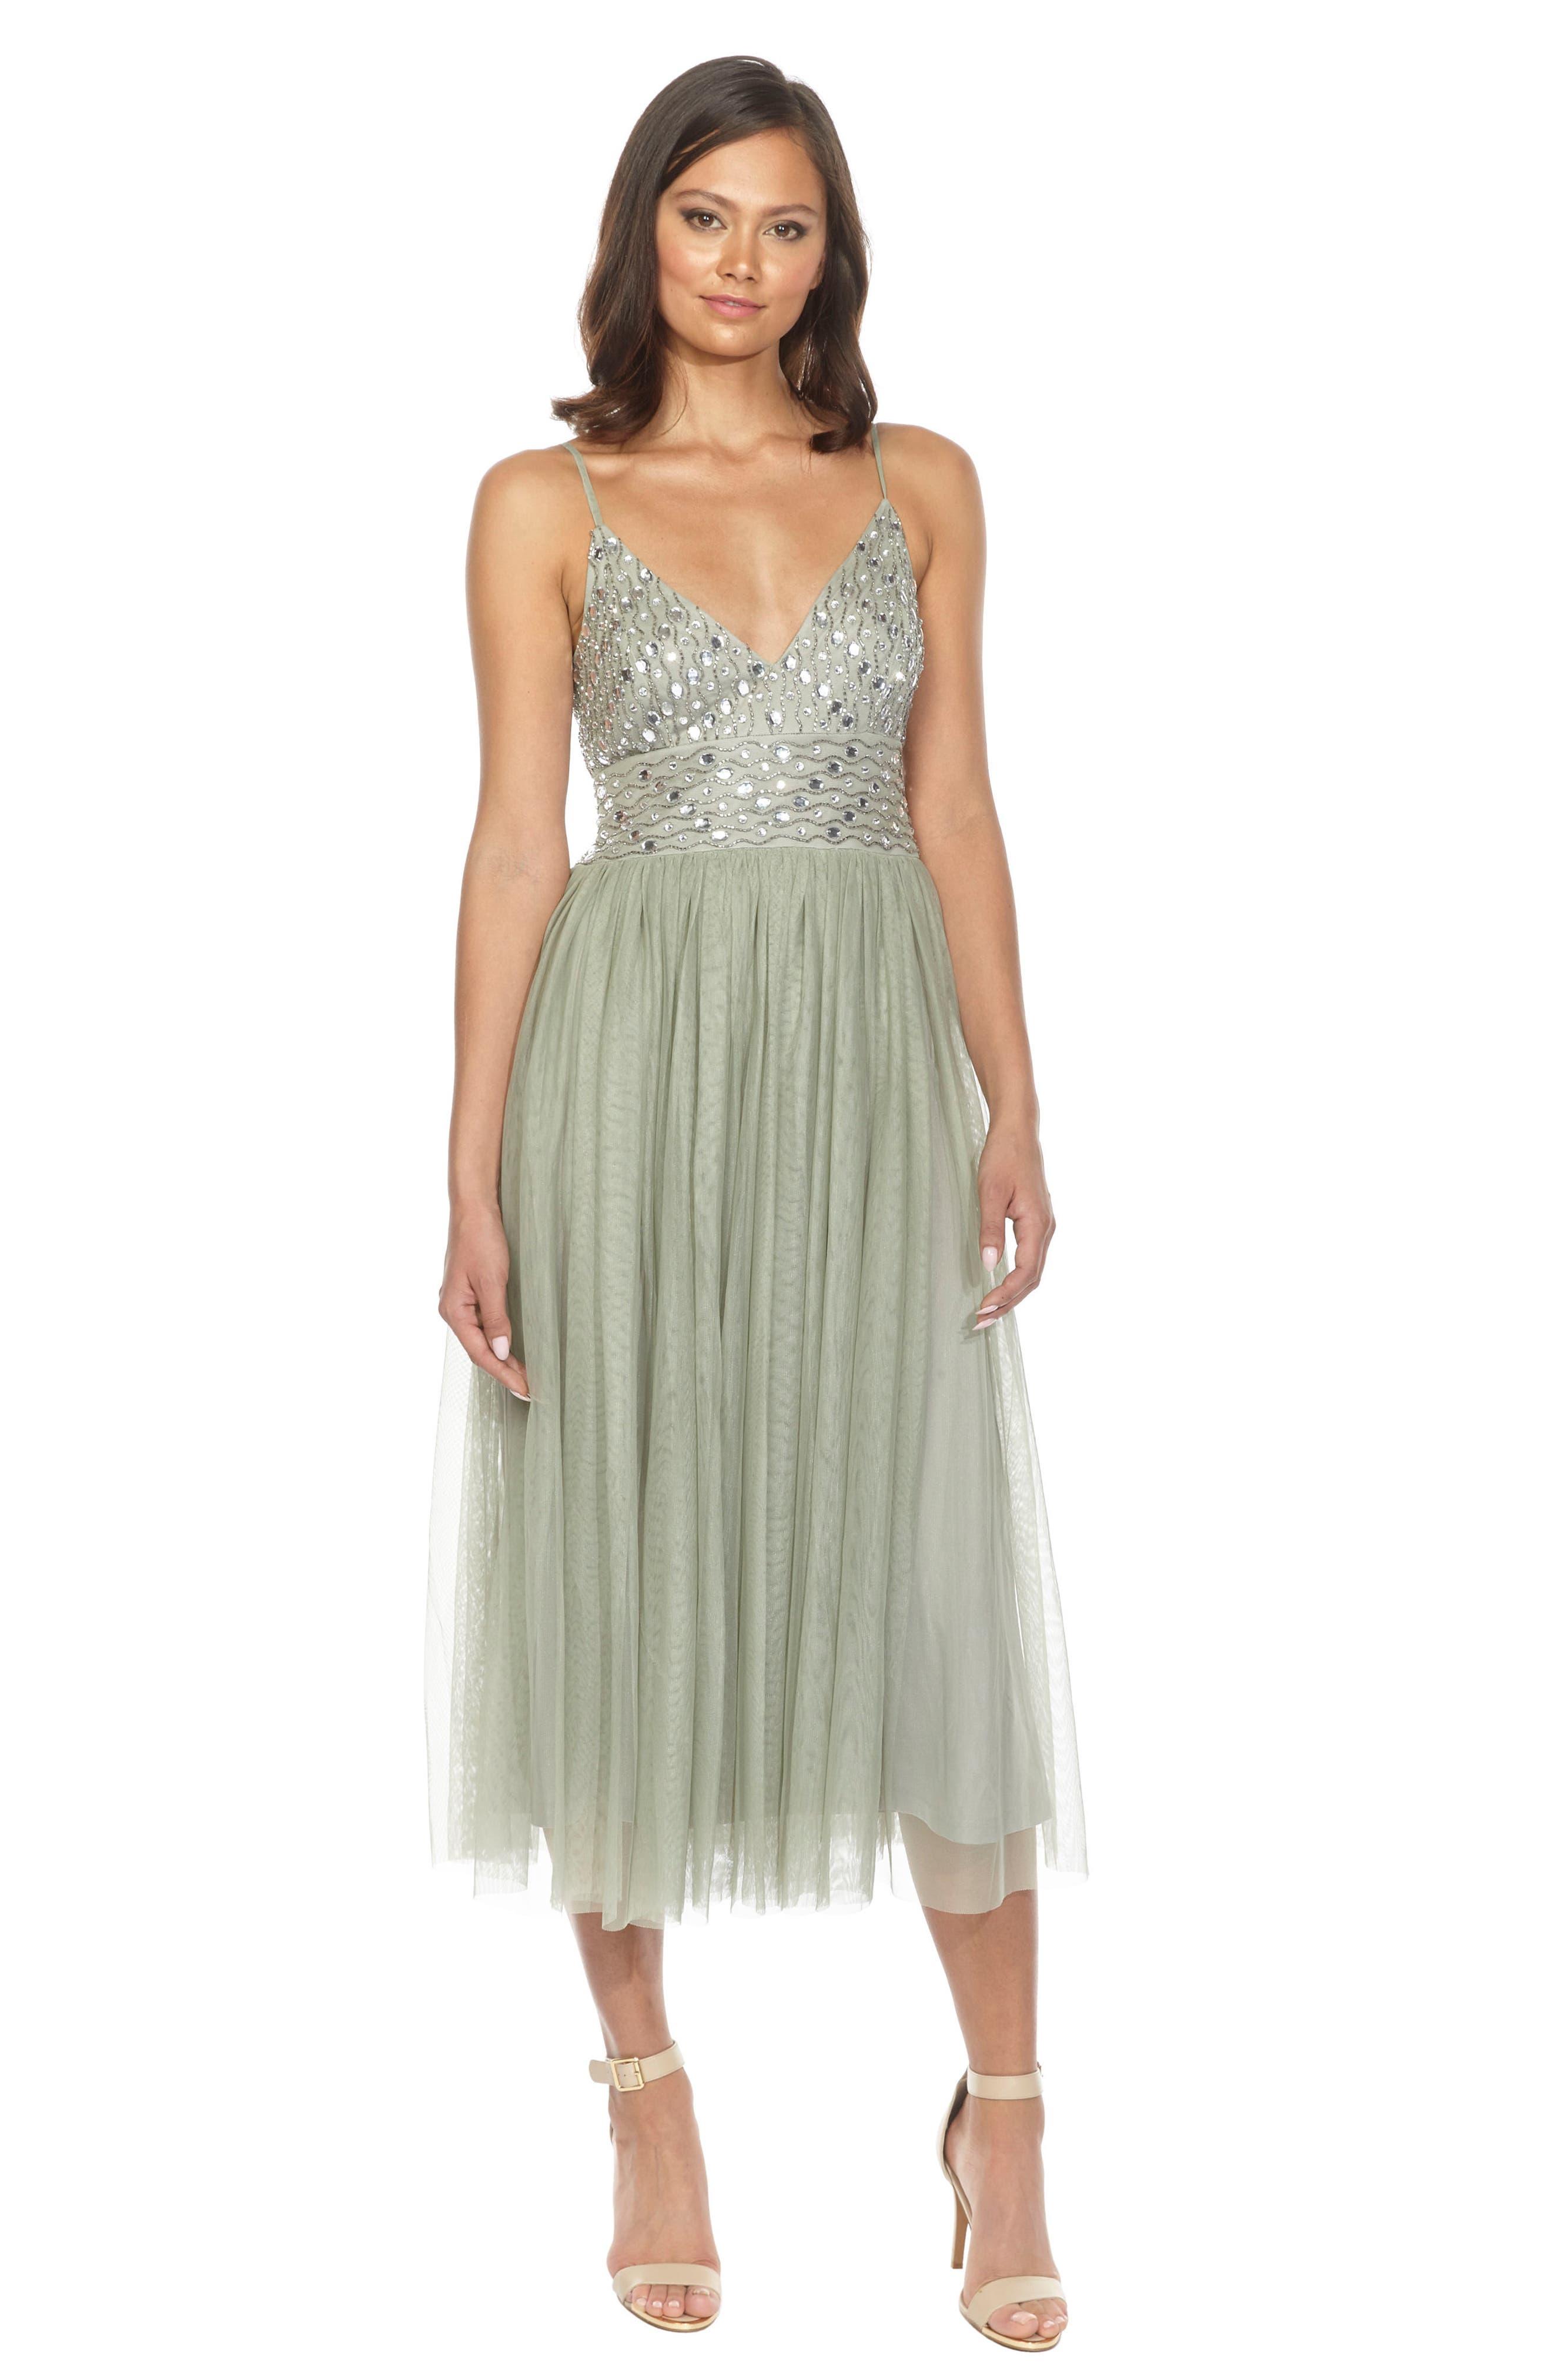 Maeve Beaded Maxi Dress,                             Alternate thumbnail 6, color,                             330